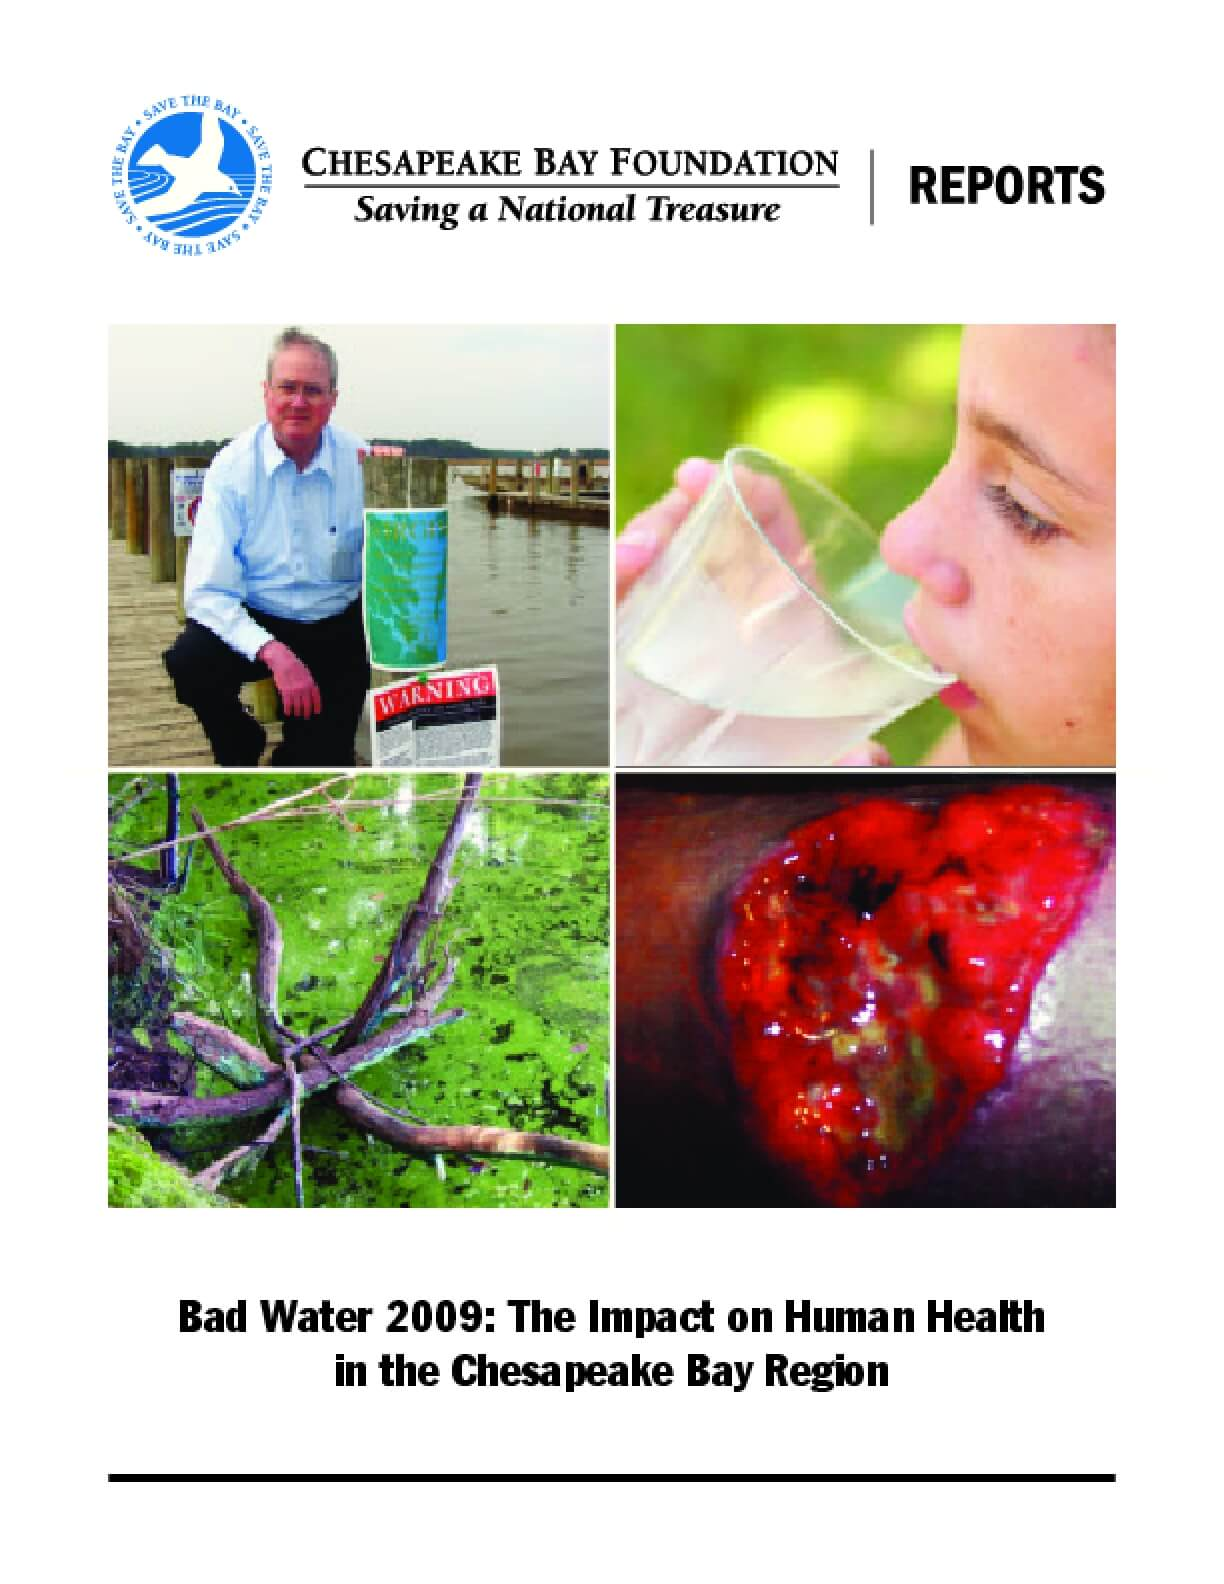 Bad Water 2009: The Impact on Human Health in the Chesapeake Bay Region